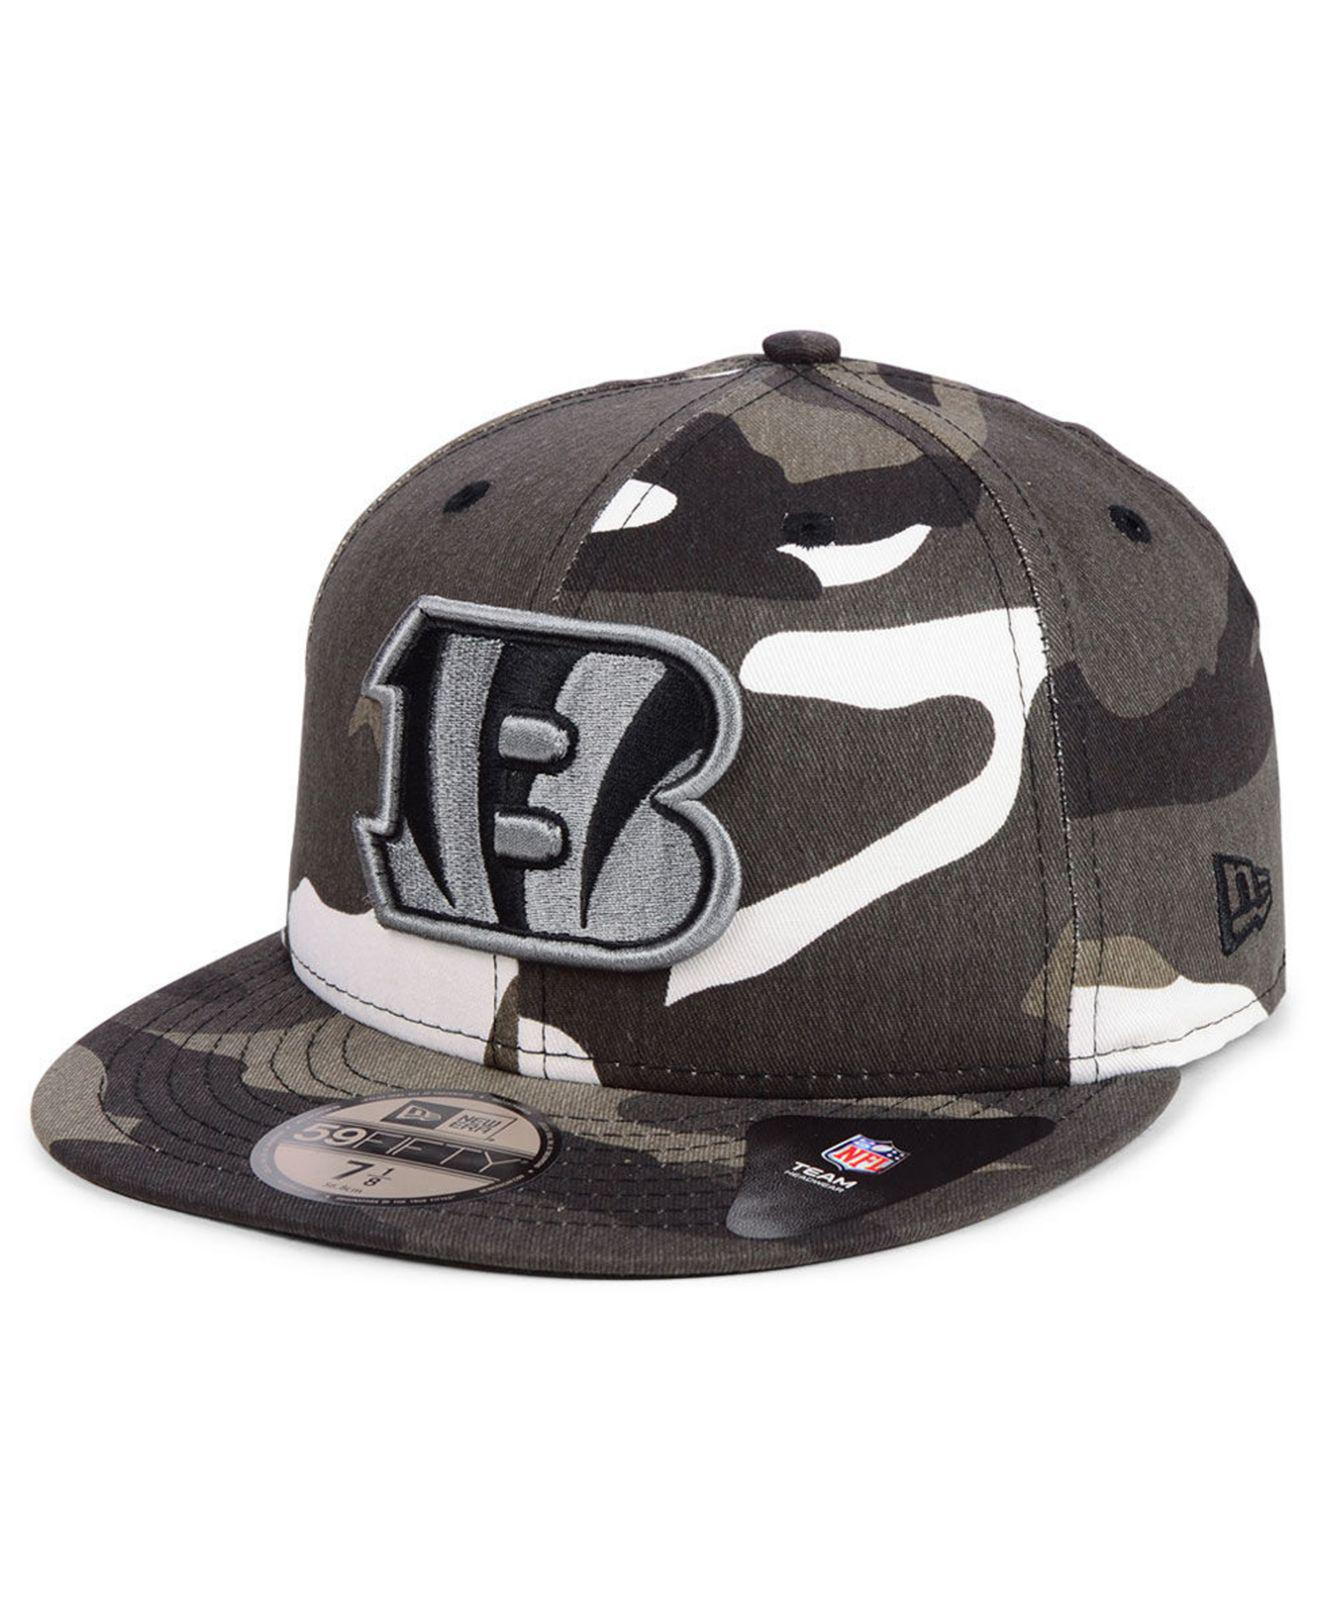 5648fb6c83996 Lyst - KTZ Cincinnati Bengals Urban Prism Pack 59fifty-fitted Cap ...